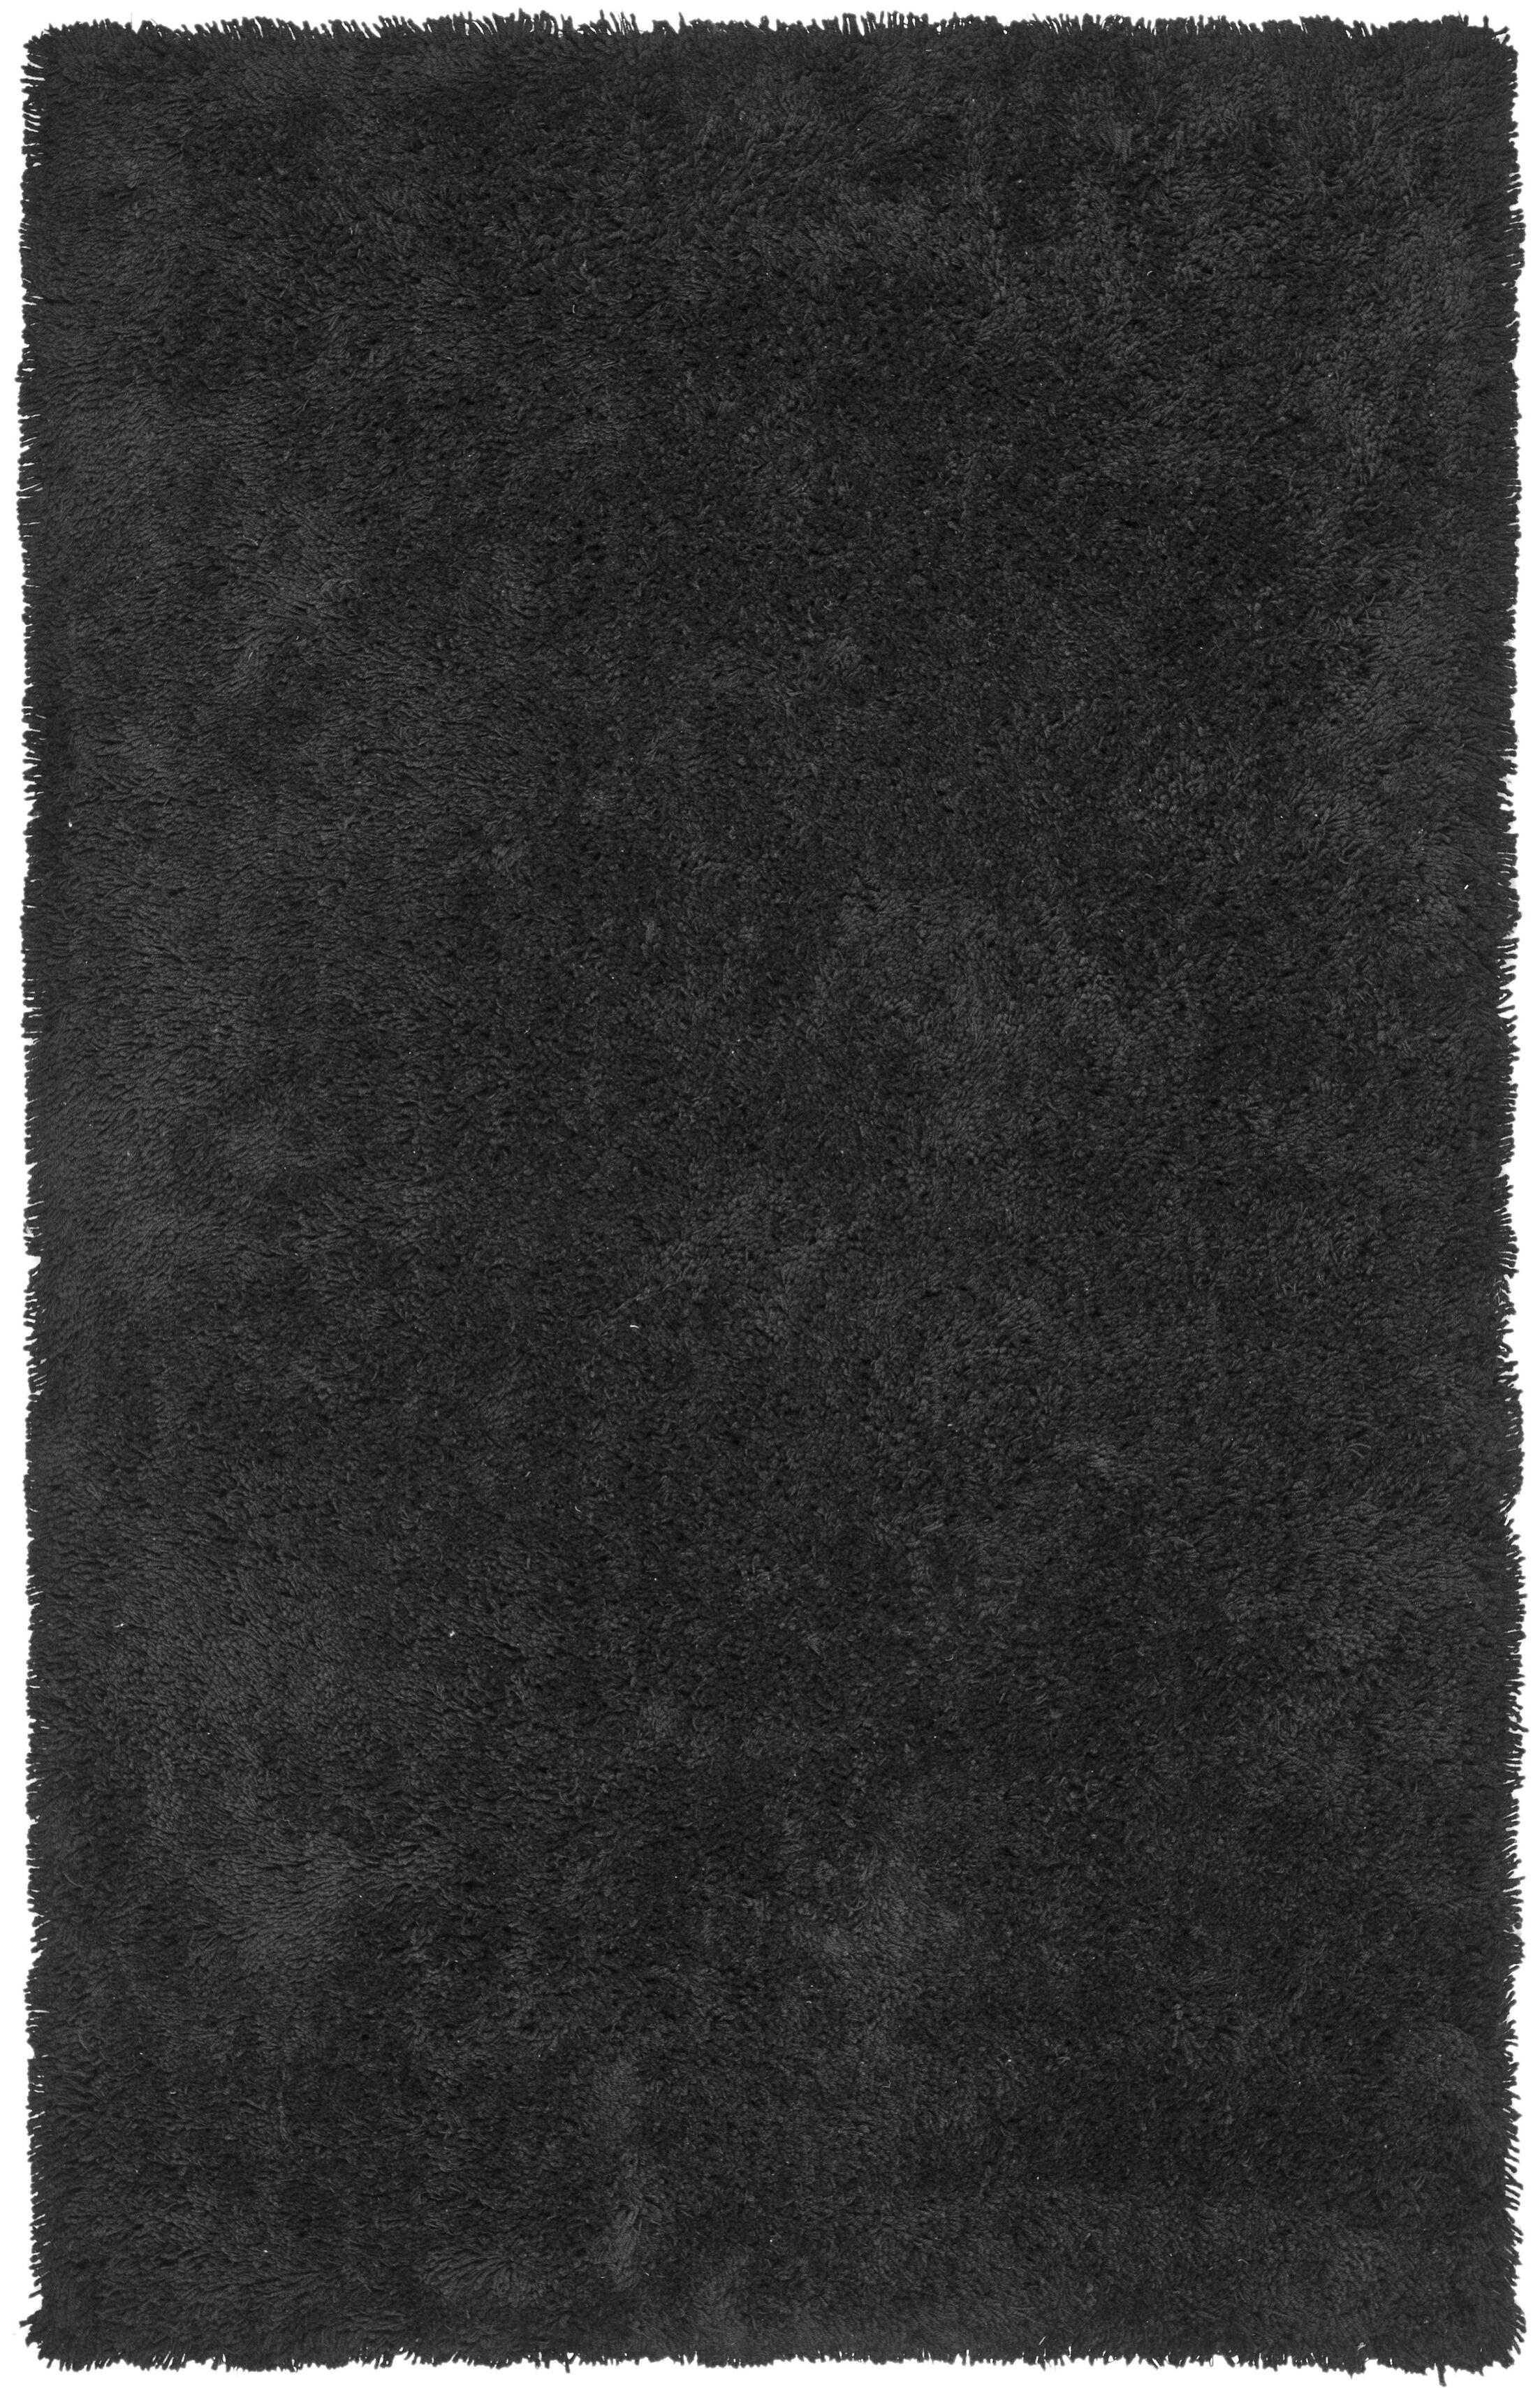 Starr Hill Solid Black Area Rug Rug Size: Rectangle 8'6